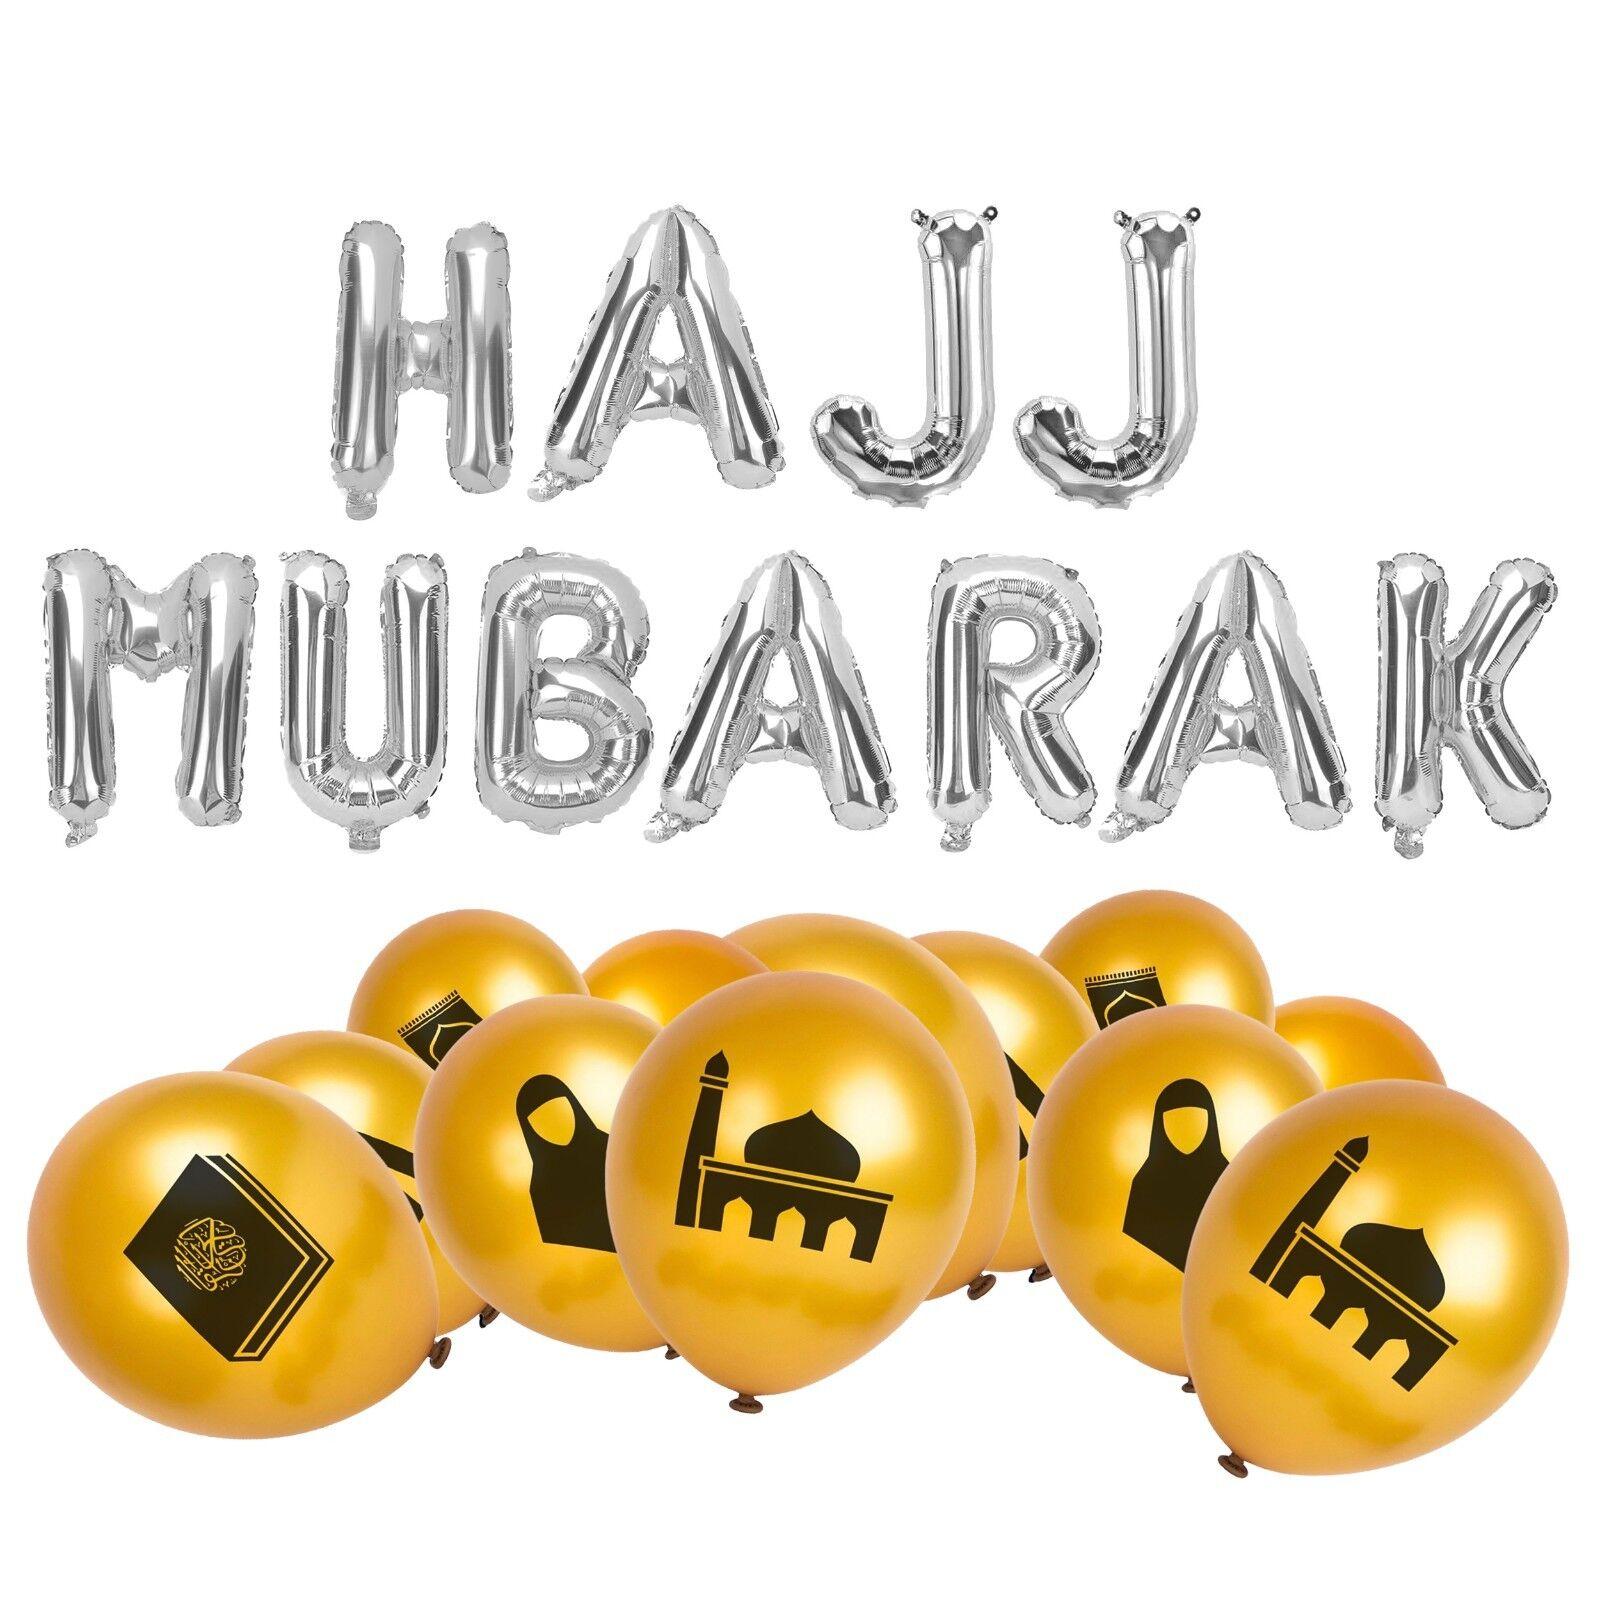 Hajj Mubarak Islamic Foil Letters + 20 Symbol Balloons - Eid Mecca Pilgrimage